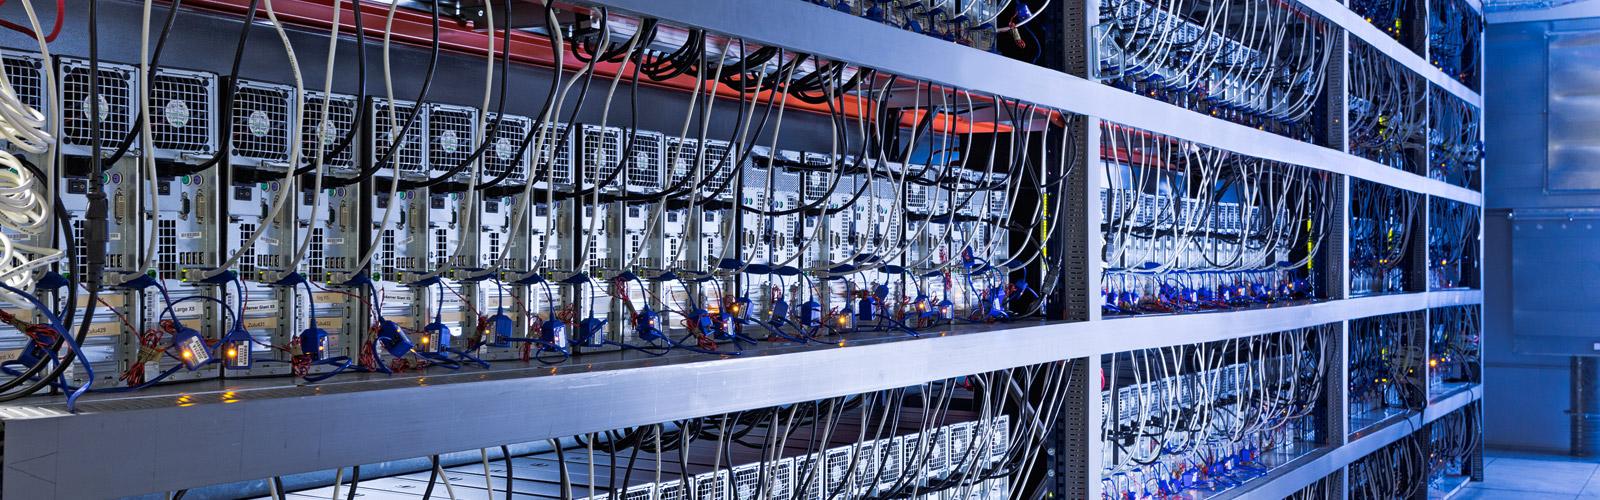 pic-main-datacenter